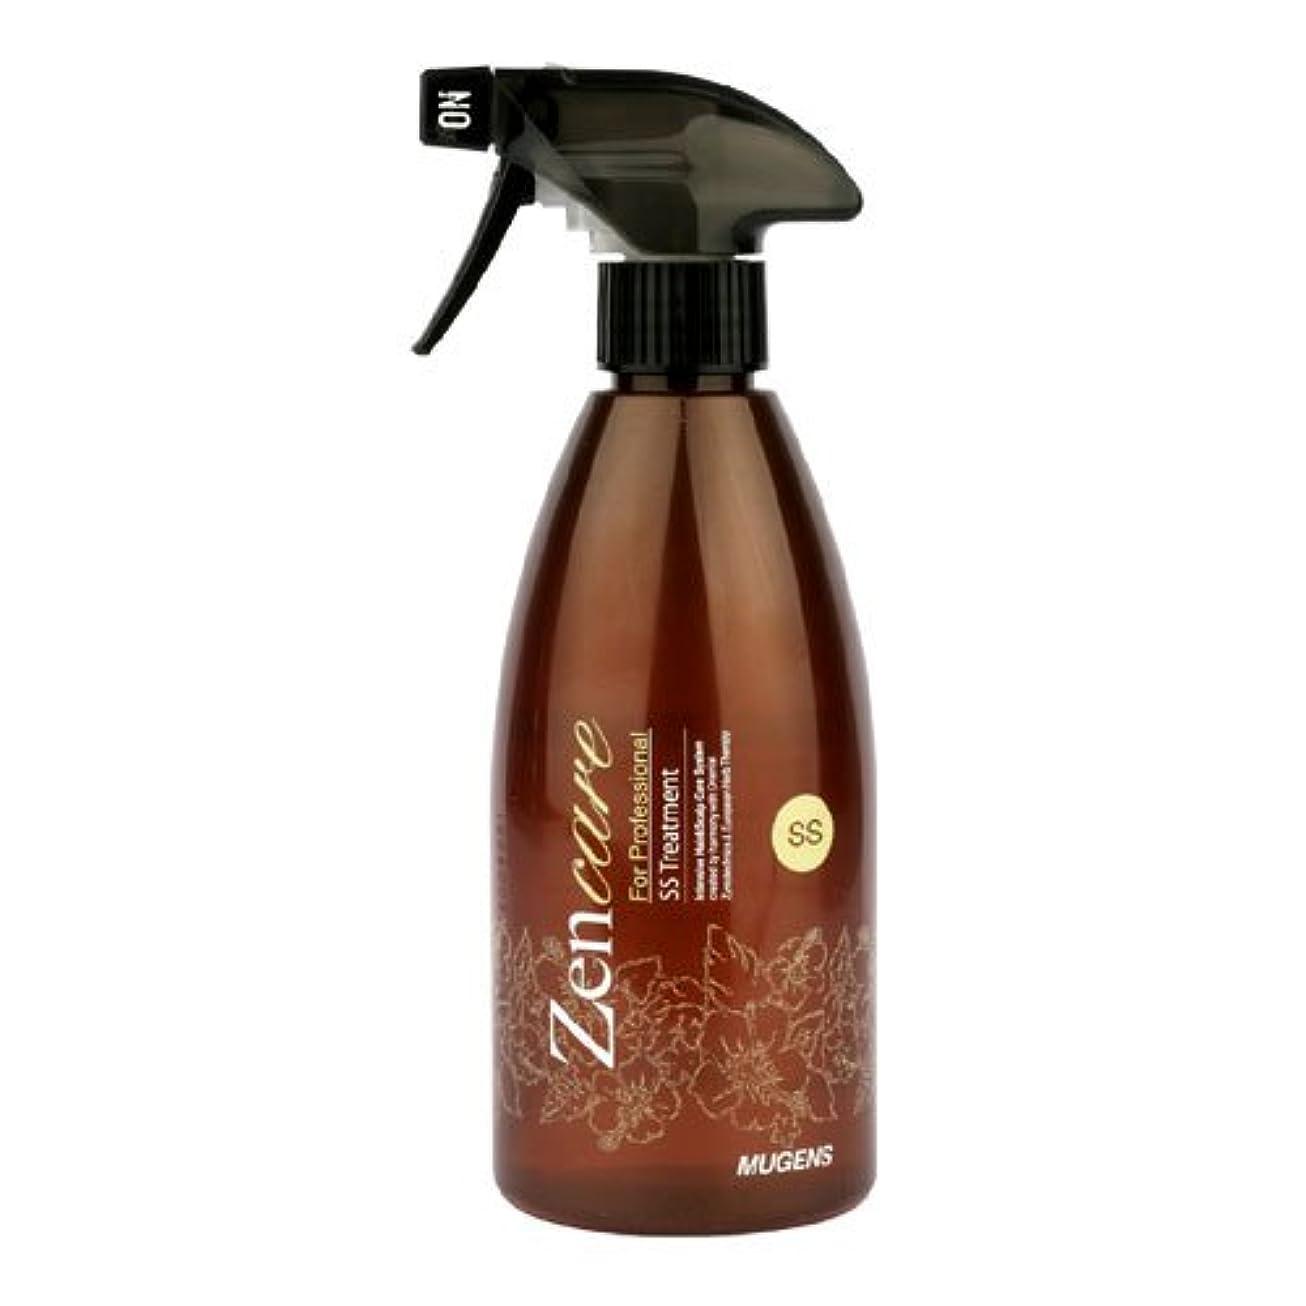 Mugens Zen Care SSヘアトリートメント500ml ダメージヘア -パーマ/染色/ブリーチ -集中ヘアケア (Mugens Zen Care SS Hair Treatment 500ml for Damaged...